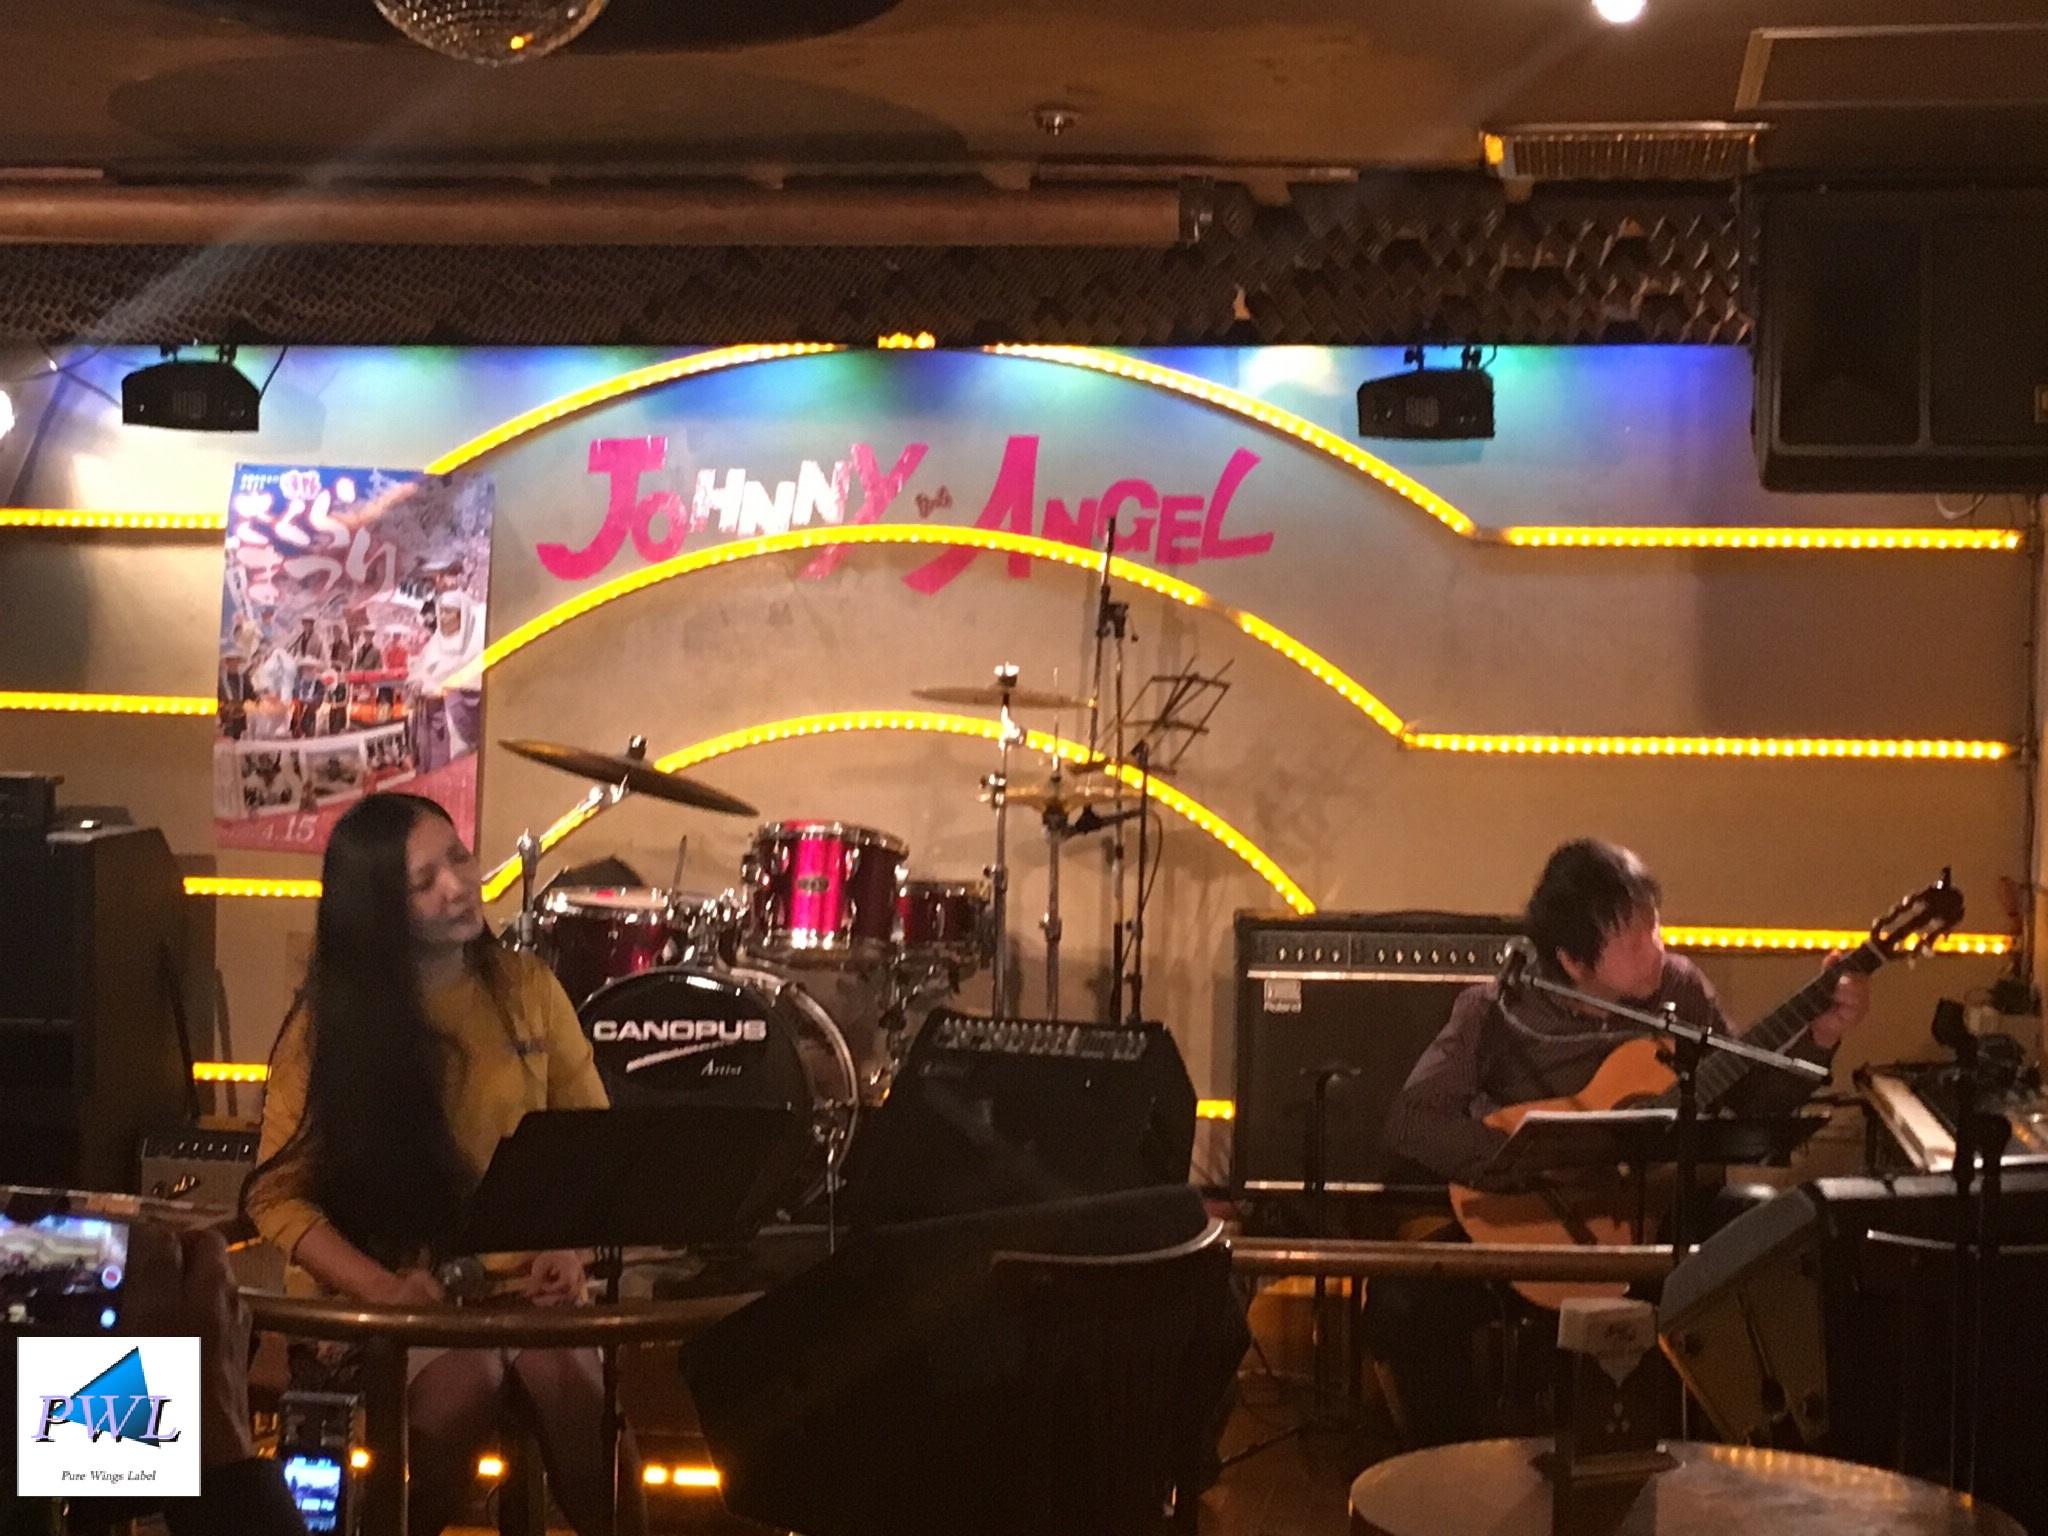 春爛漫♪ 0415(土)Live「PureWings in小岩」開催決定!★出演者募集残り1組★